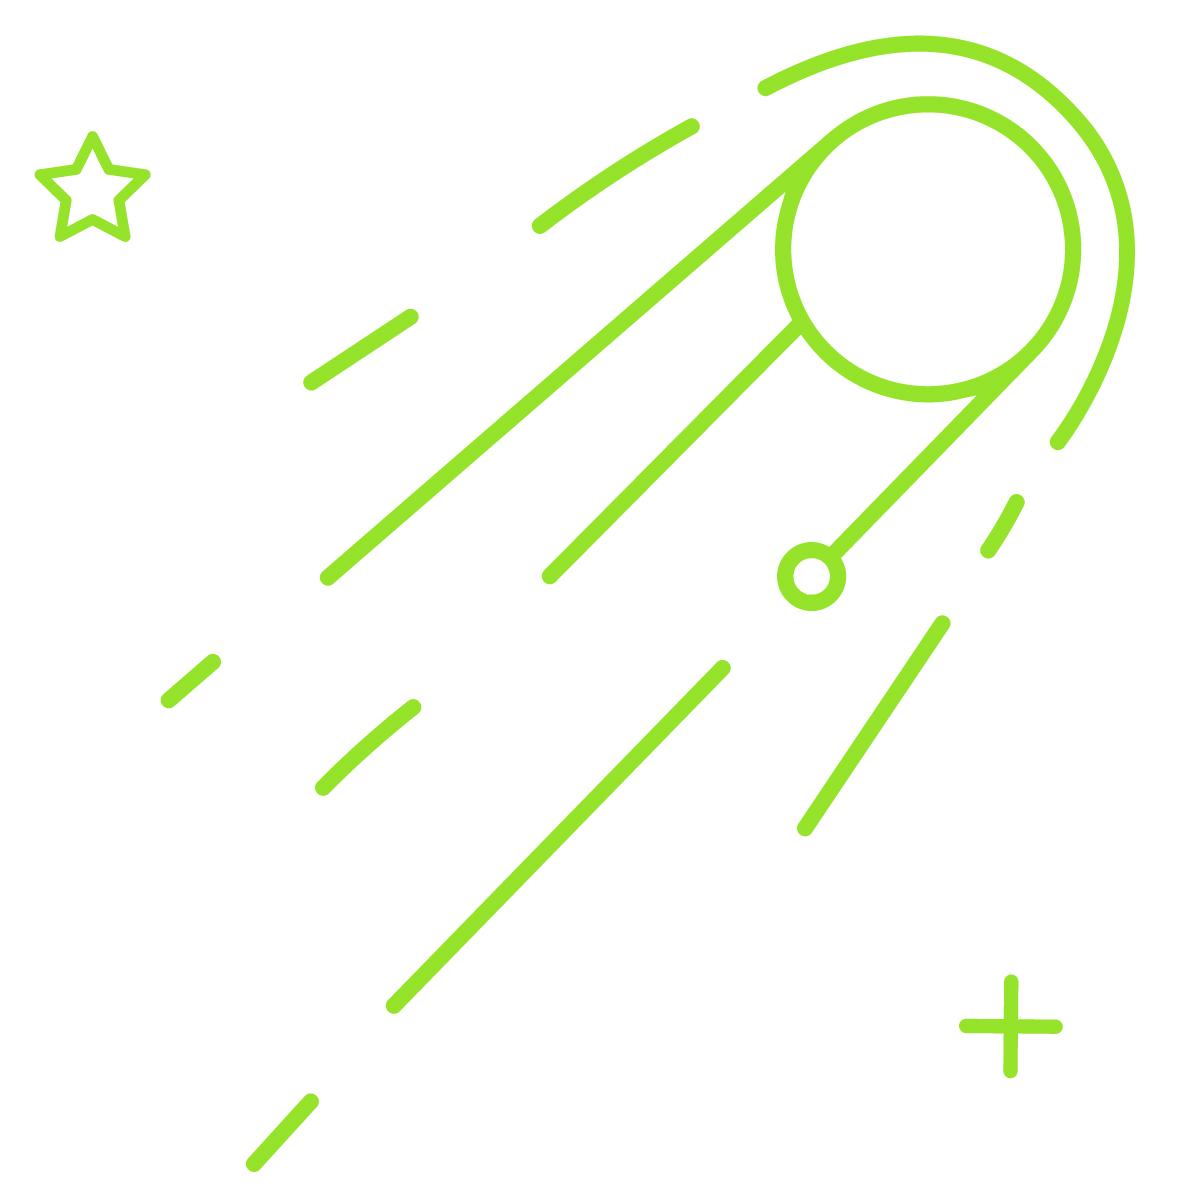 ICONS_GRP-04-1